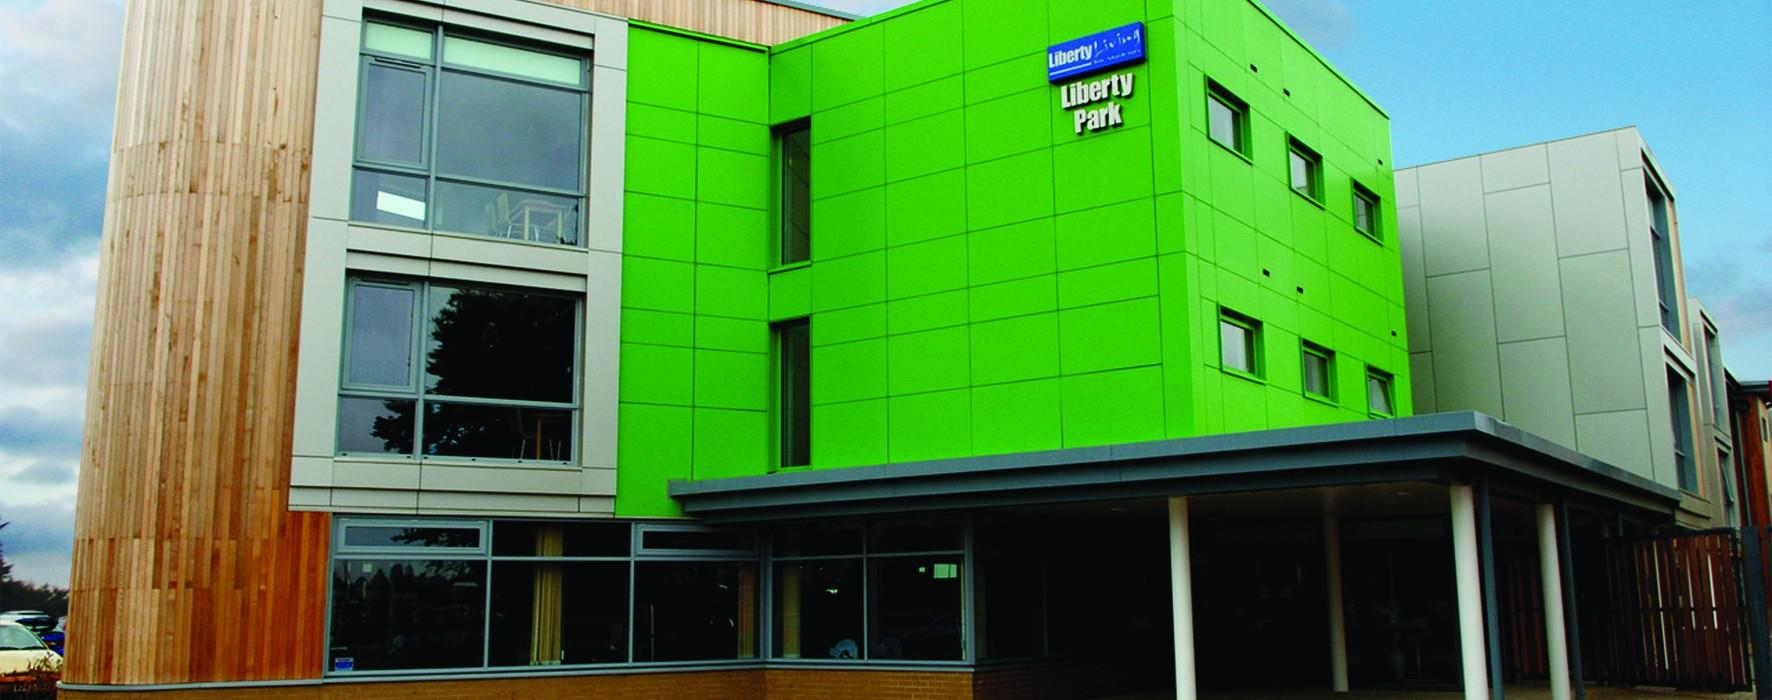 Polhill Campus University Polhill Campus Phase 1